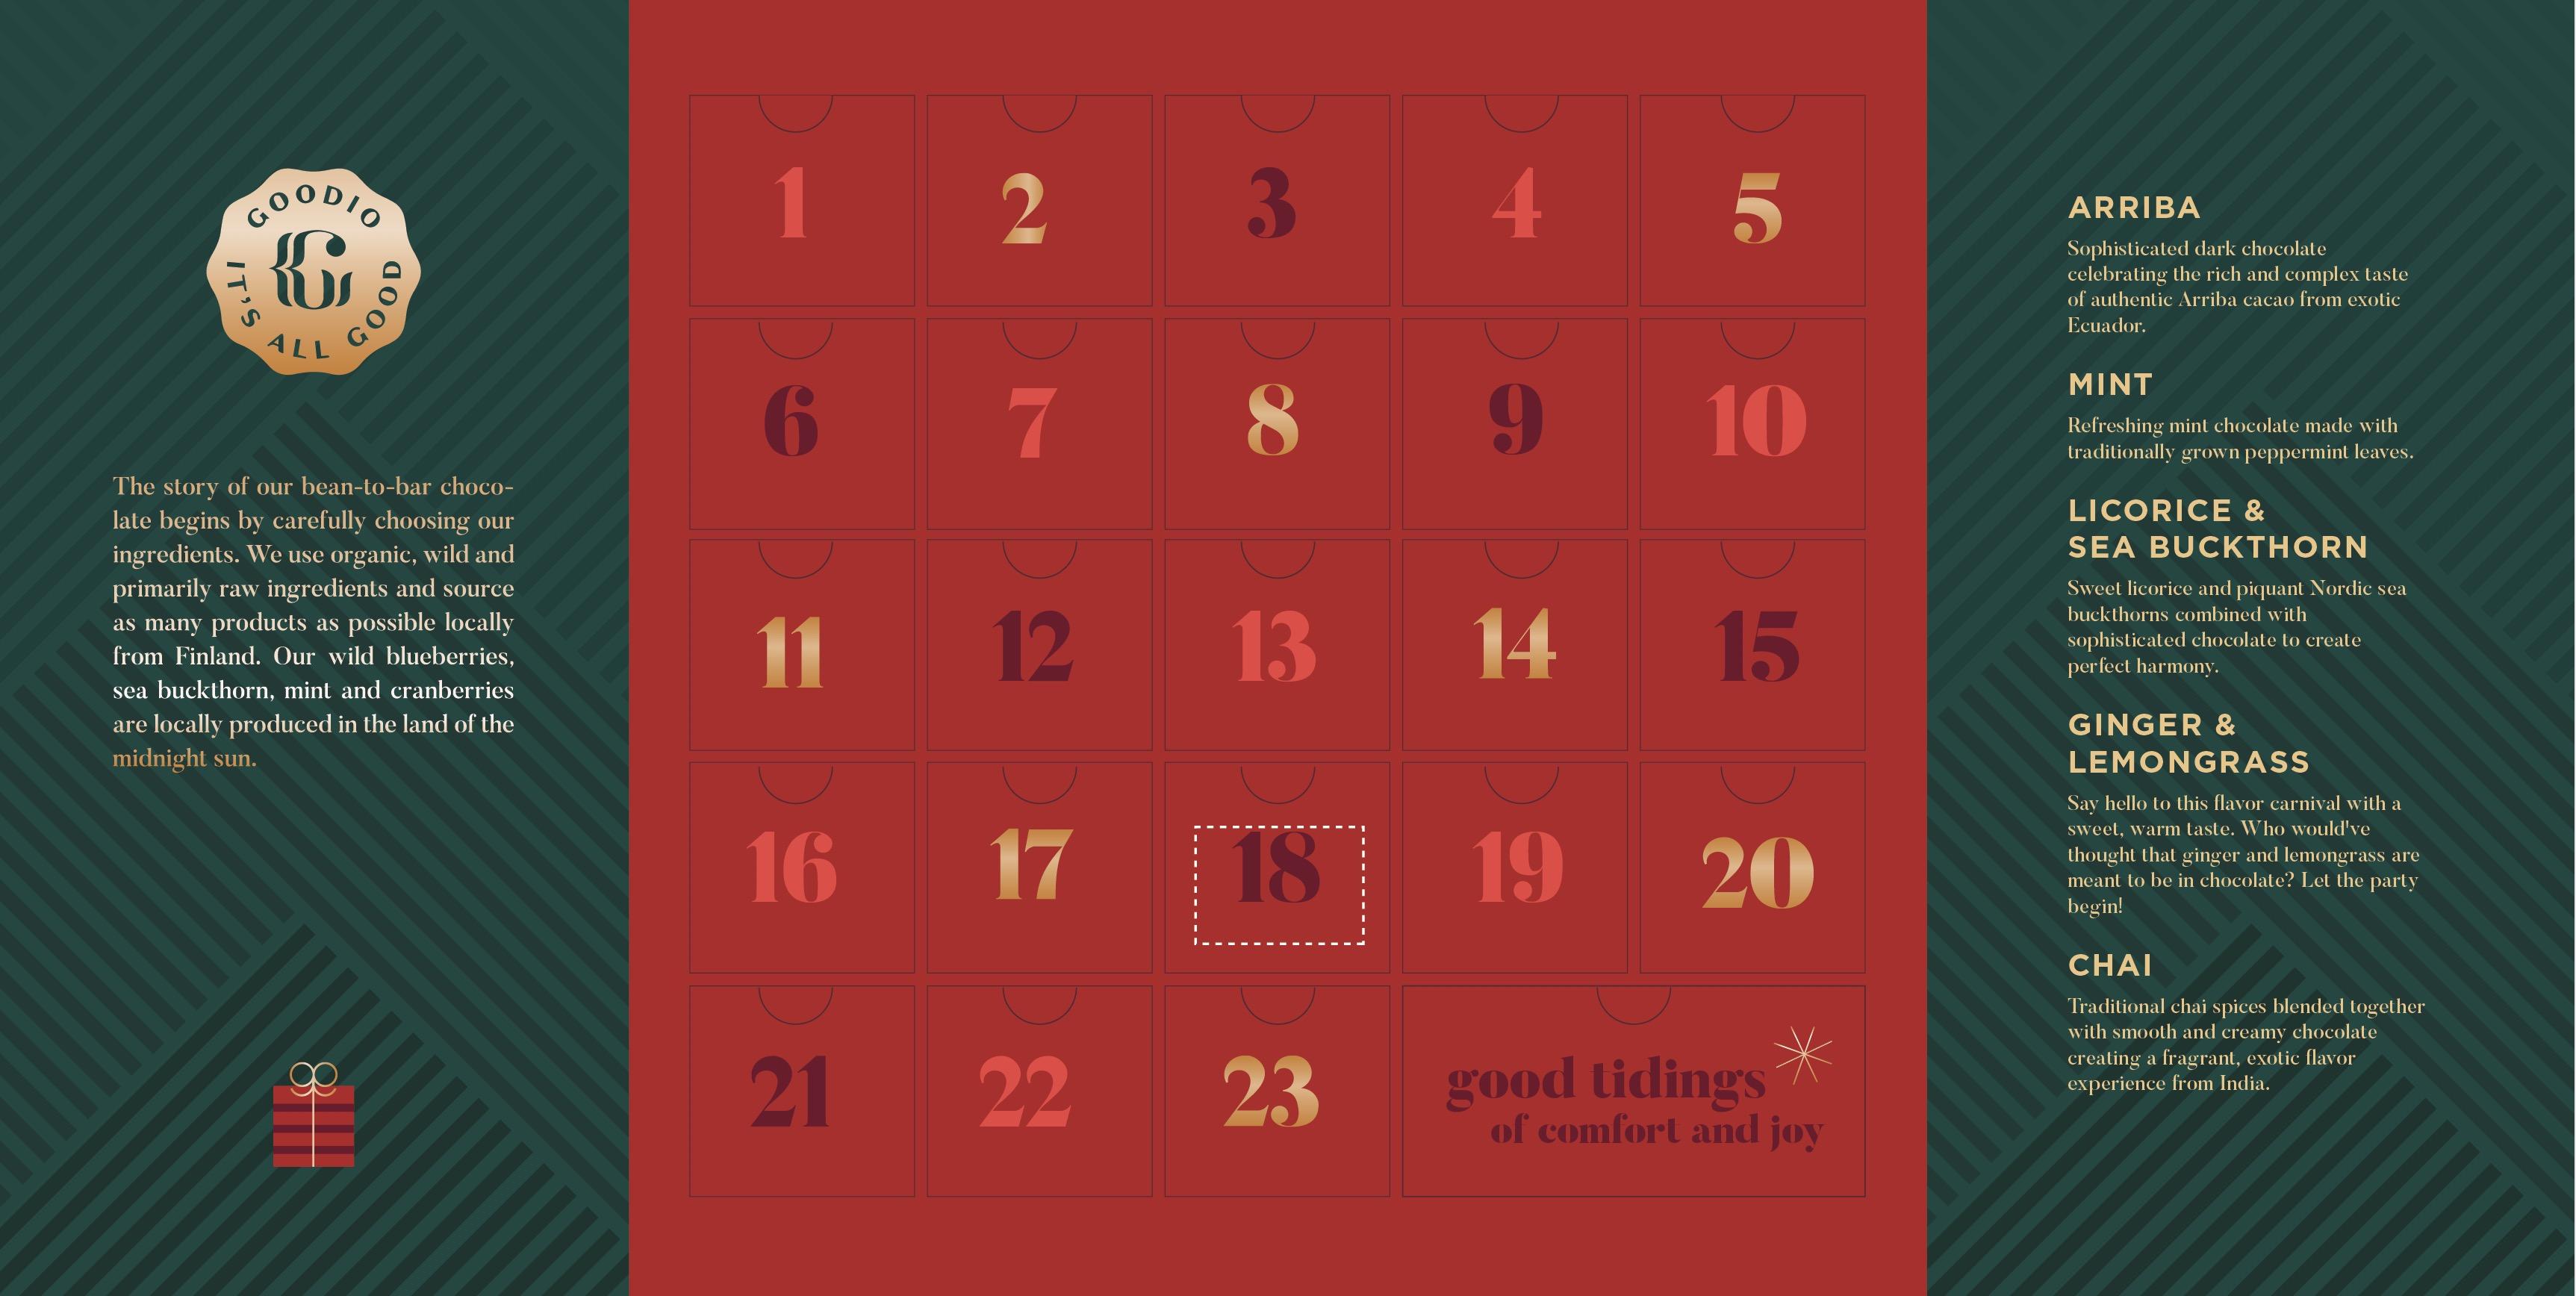 Goodio advent calendar countdown to christmas